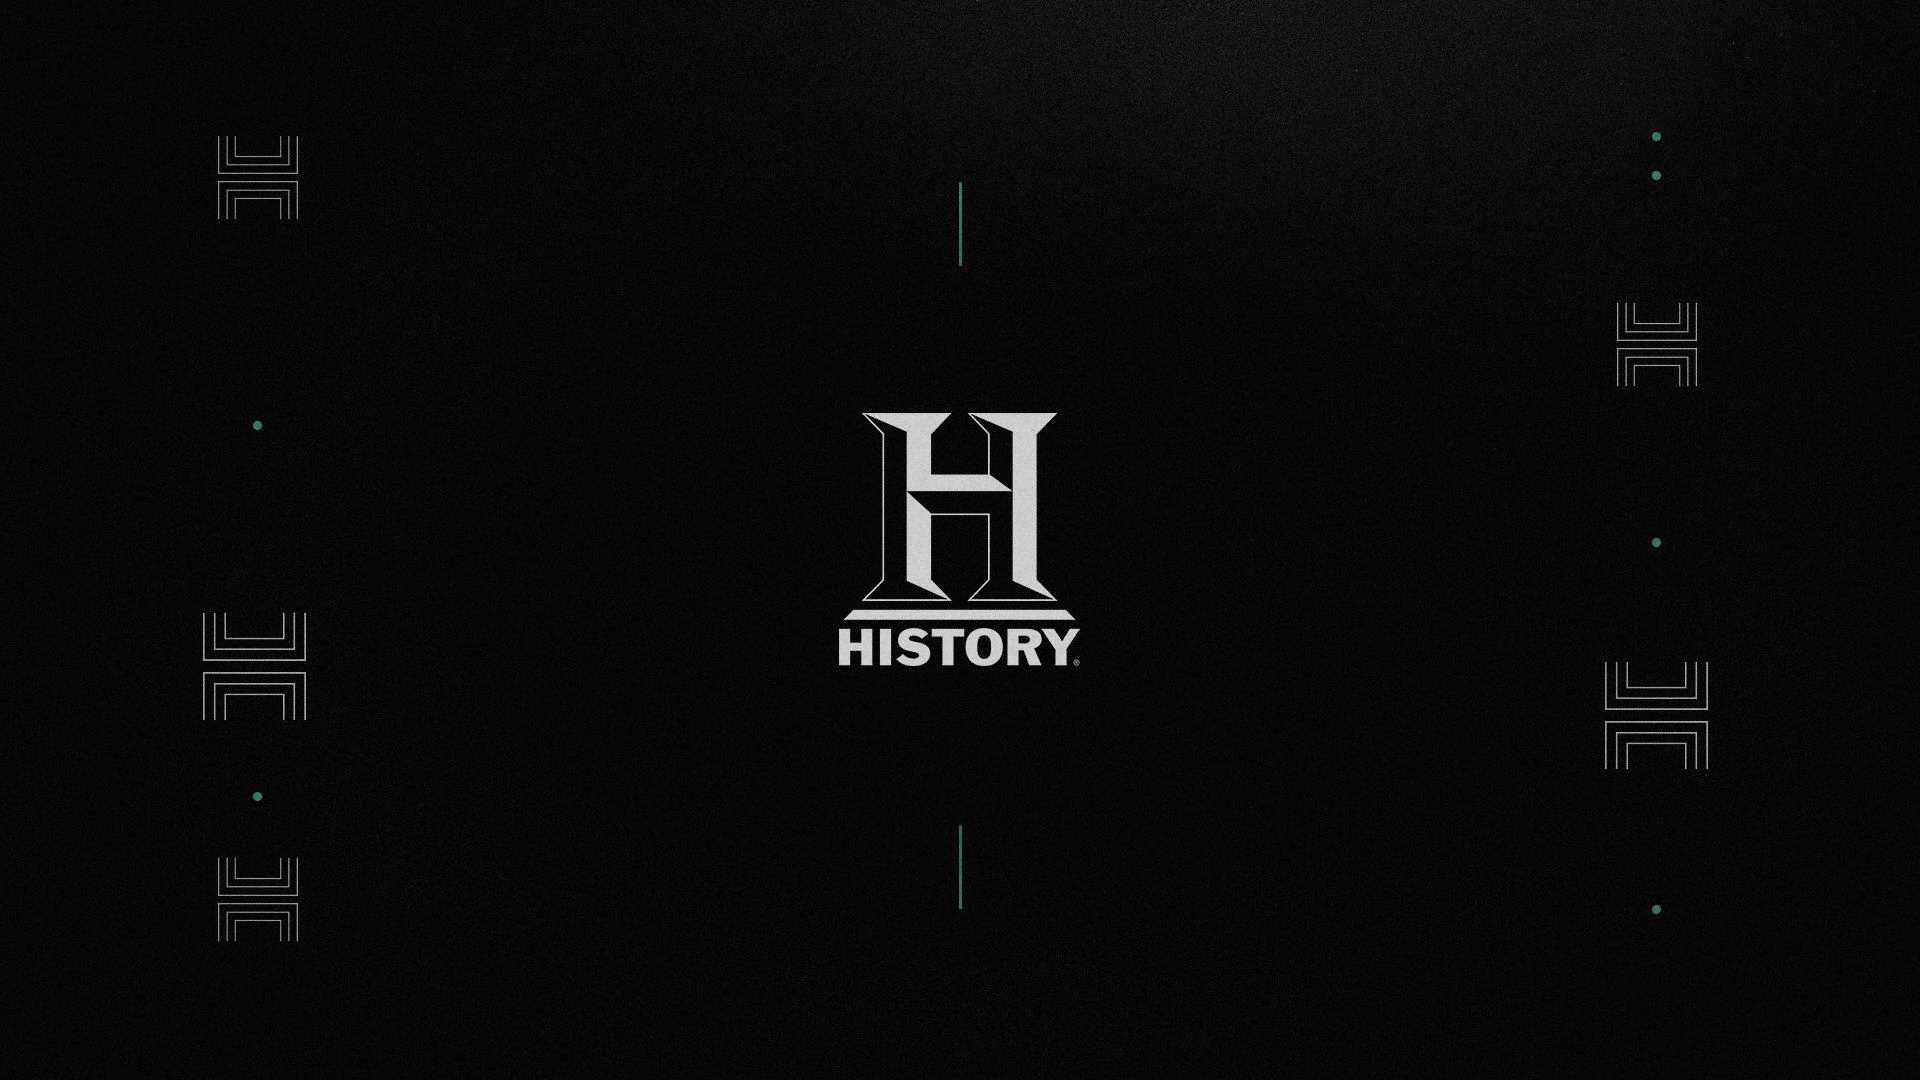 A+E_Upfront_History_01_titlecard.jpg